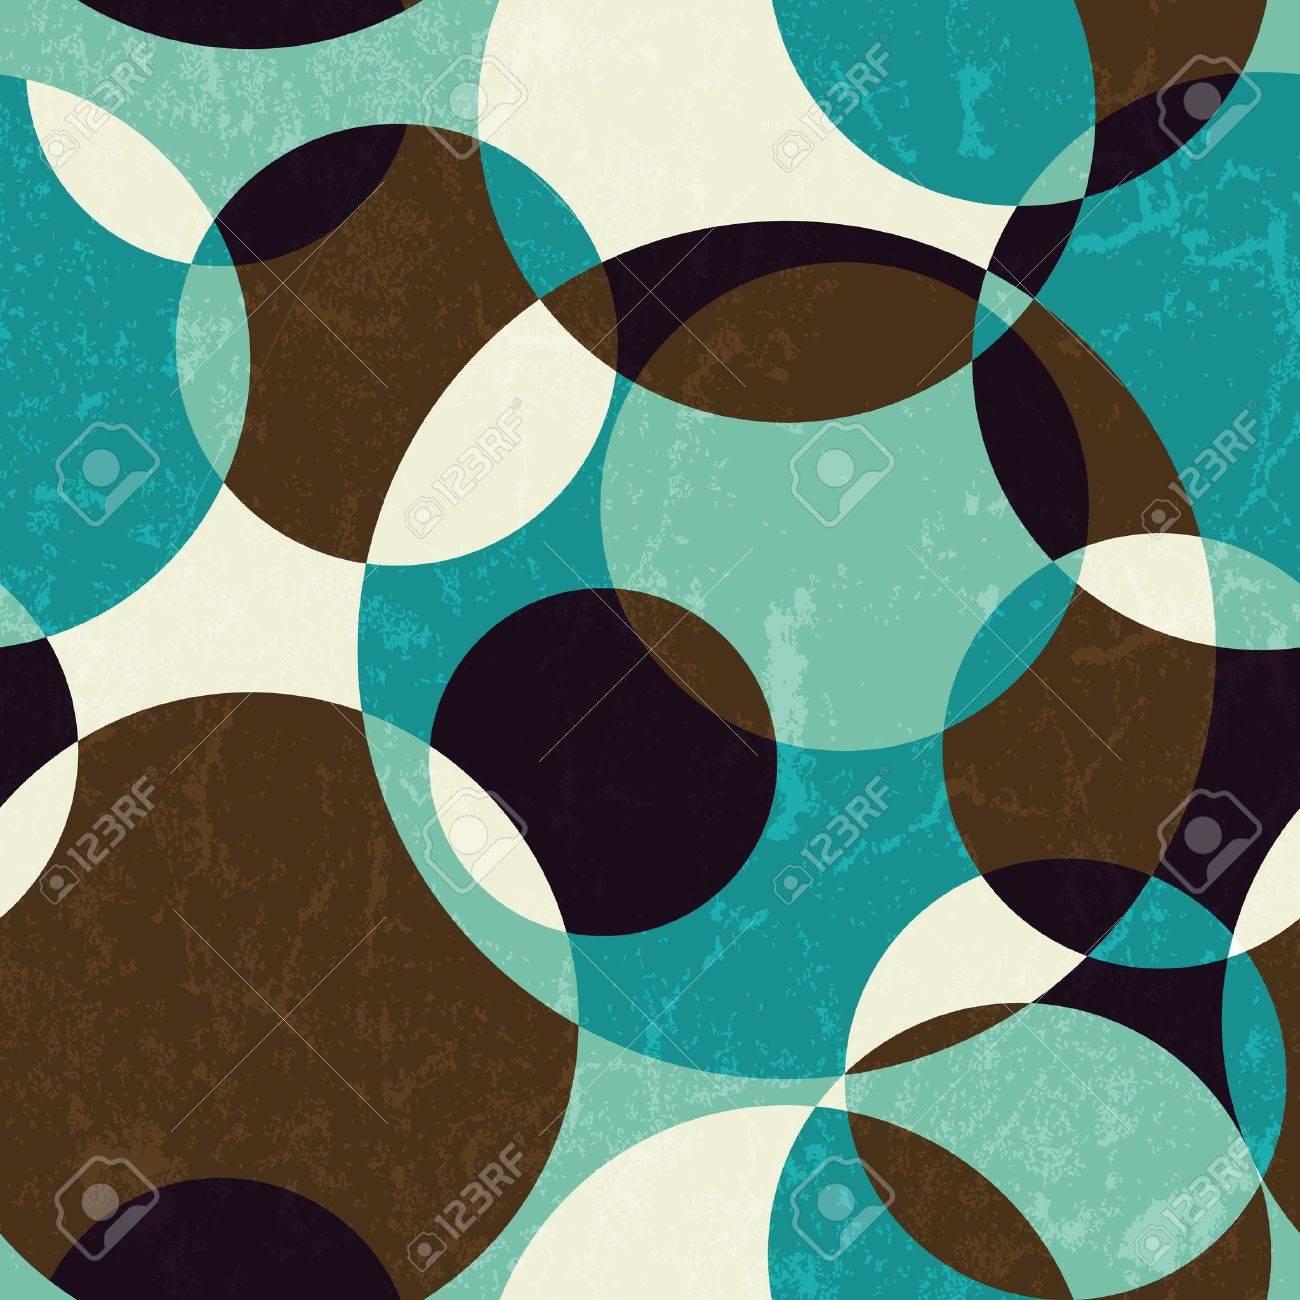 Retro abstract seamless pattern  EPS 10 vector illustration Stock Vector - 17668217